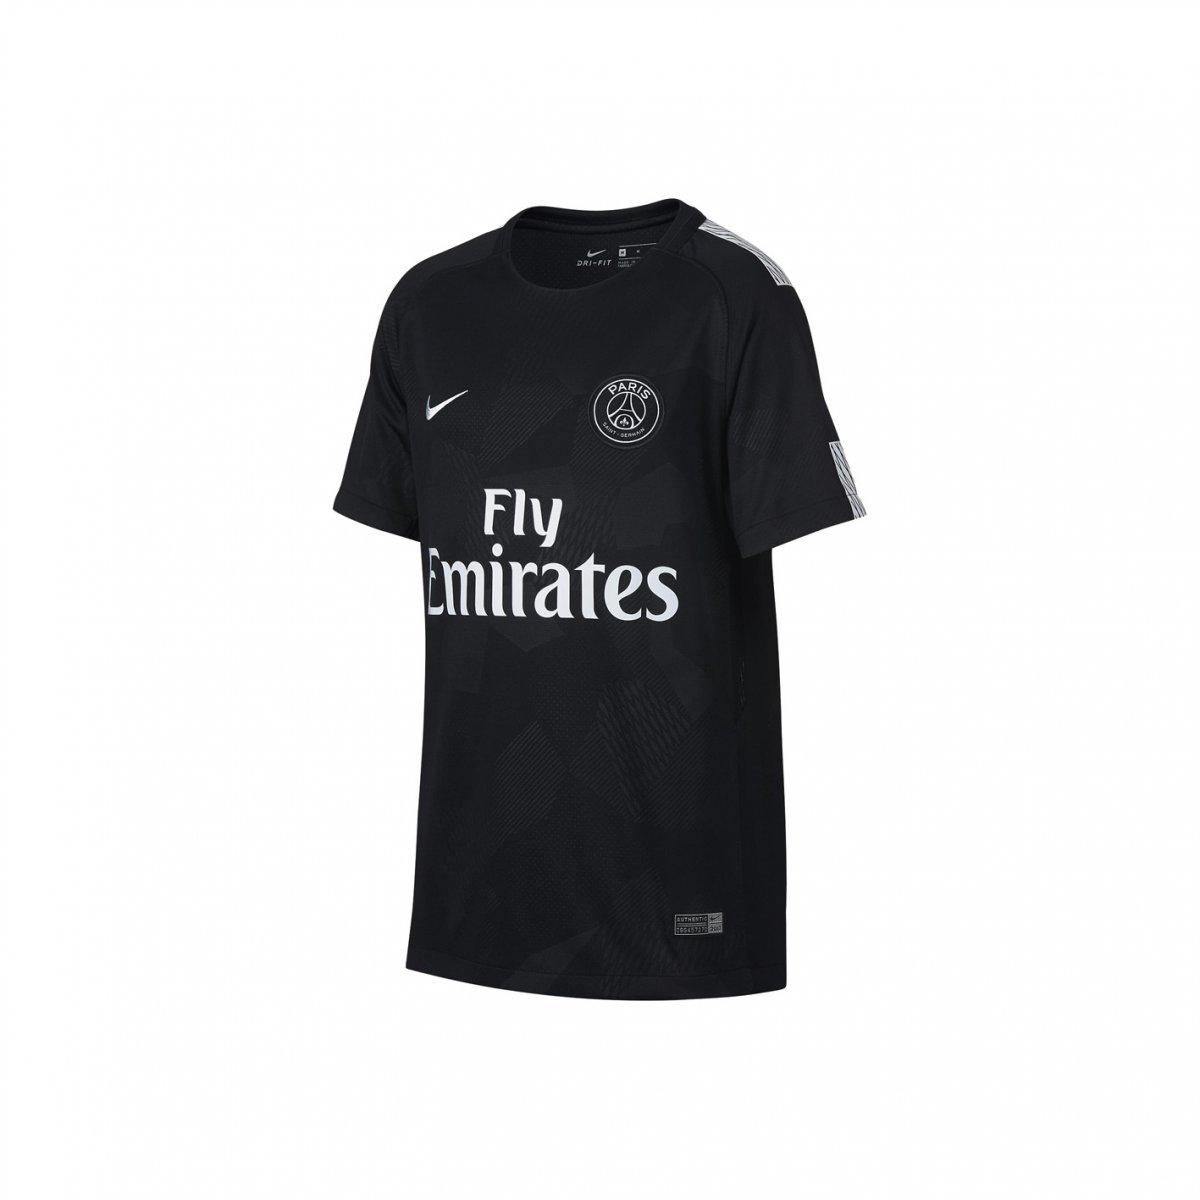 aa8a3e818f Amplie a imagem. Camiseta Infantil Nike Paris Saint Germain III 2017/18;  Camiseta Infantil Nike Paris ...